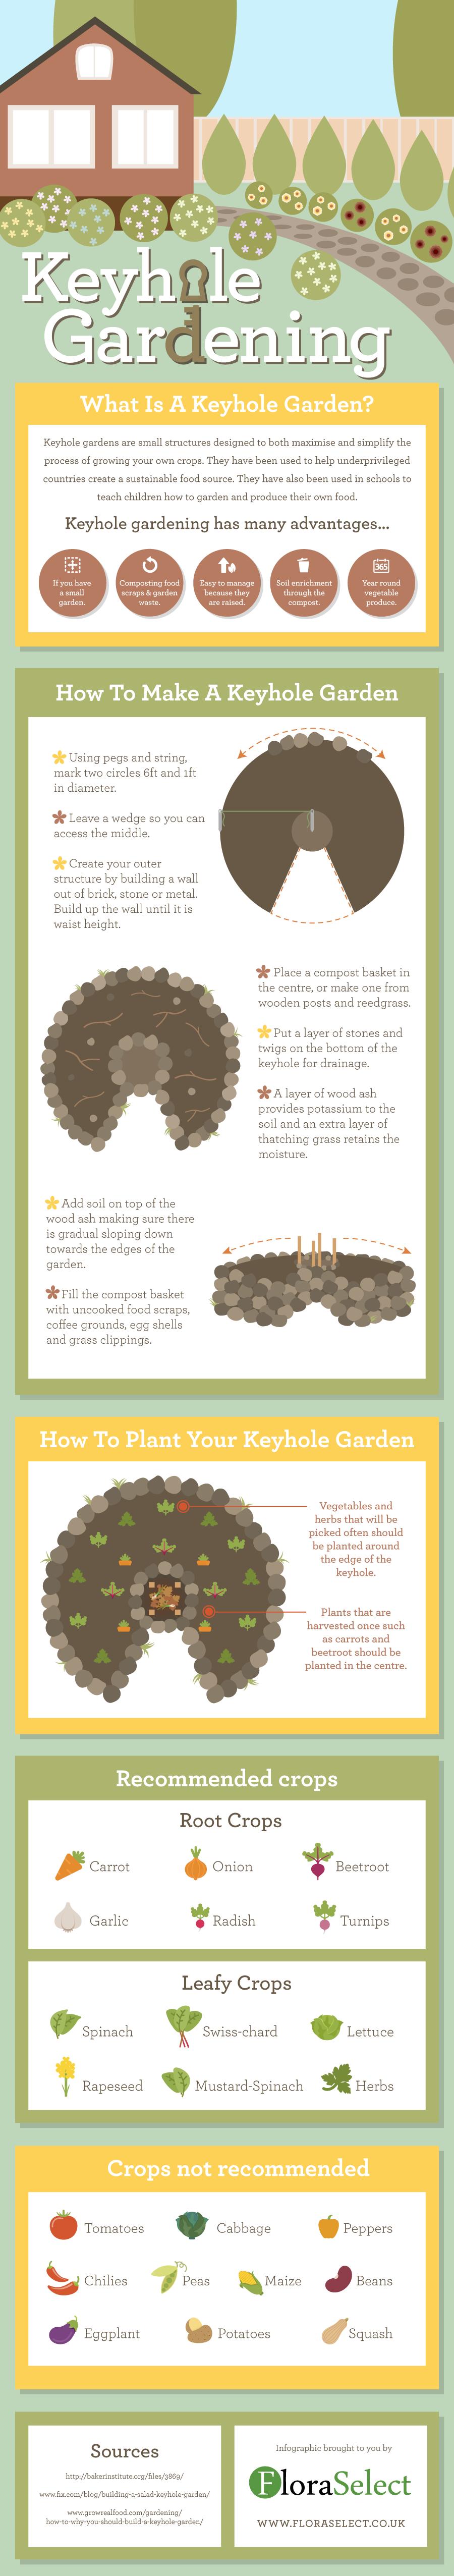 keyhole gardening infographic bah e pinterest hochbeet g rten und permakultur. Black Bedroom Furniture Sets. Home Design Ideas